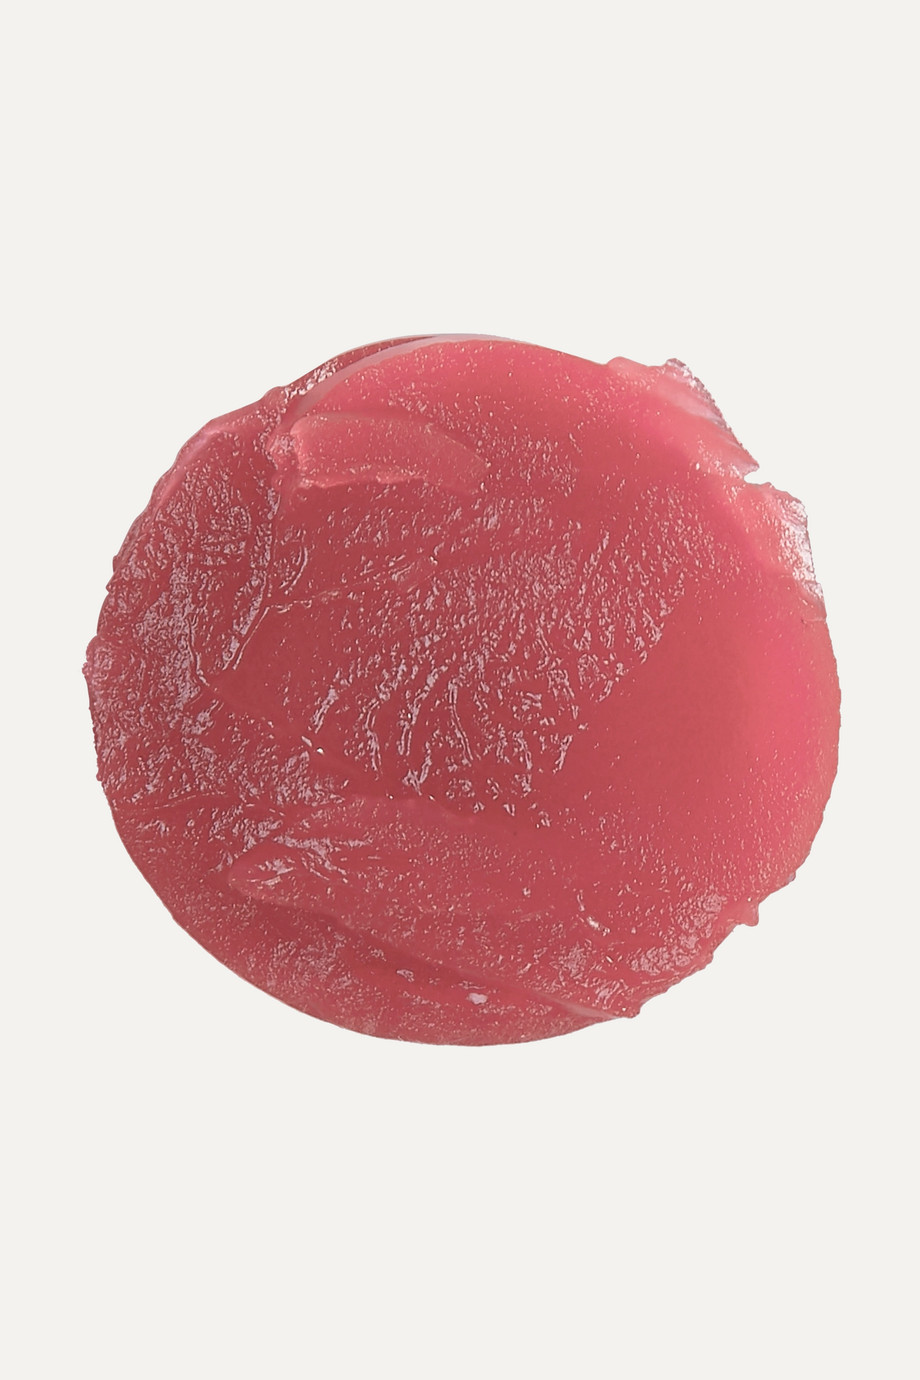 Bobbi Brown Extra Lip Tint - Bare Punch